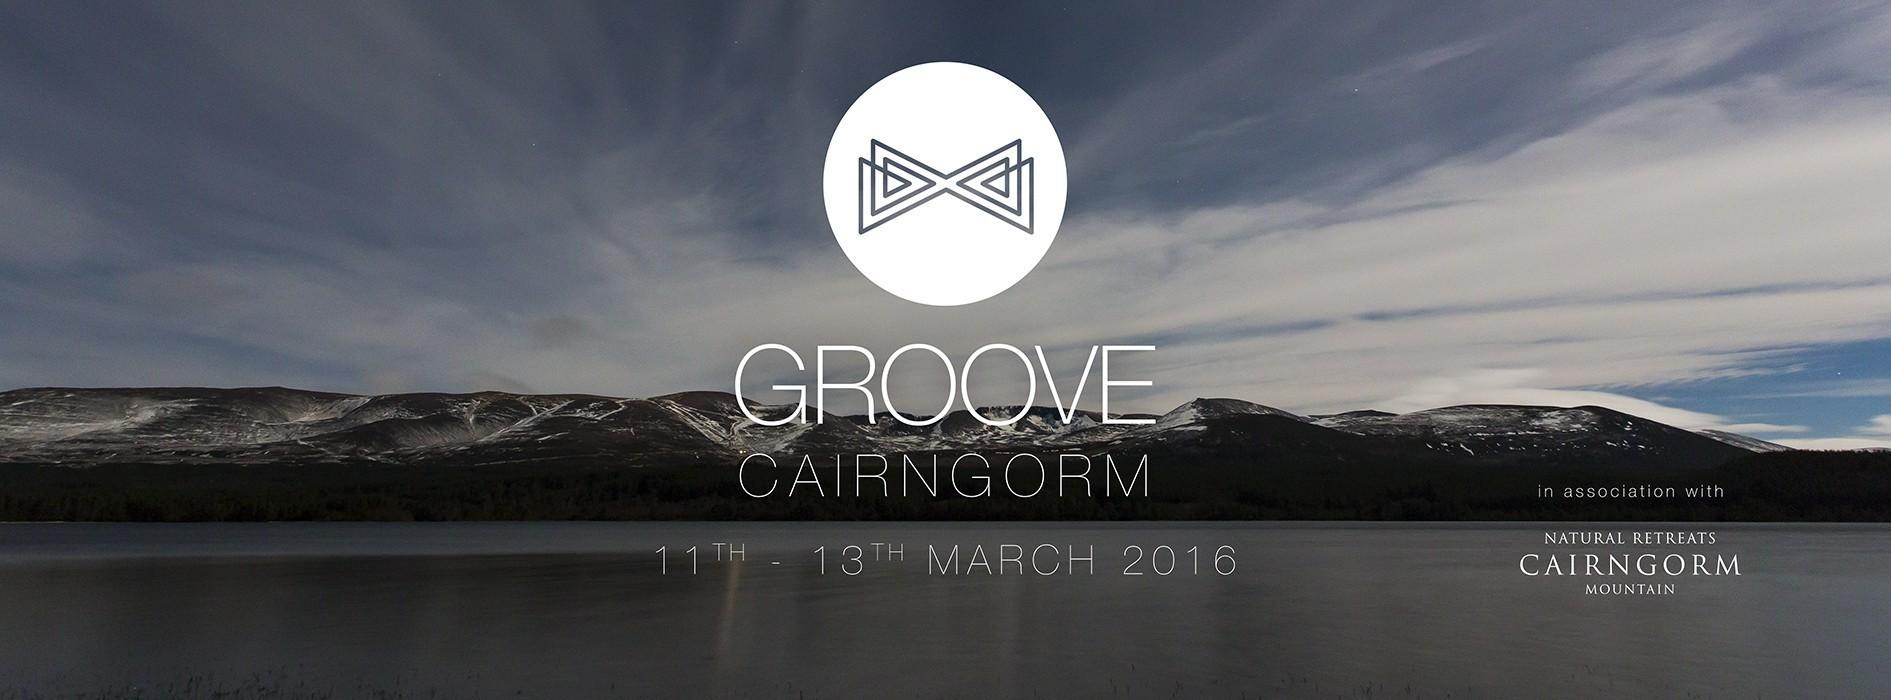 Groove Cairngorm